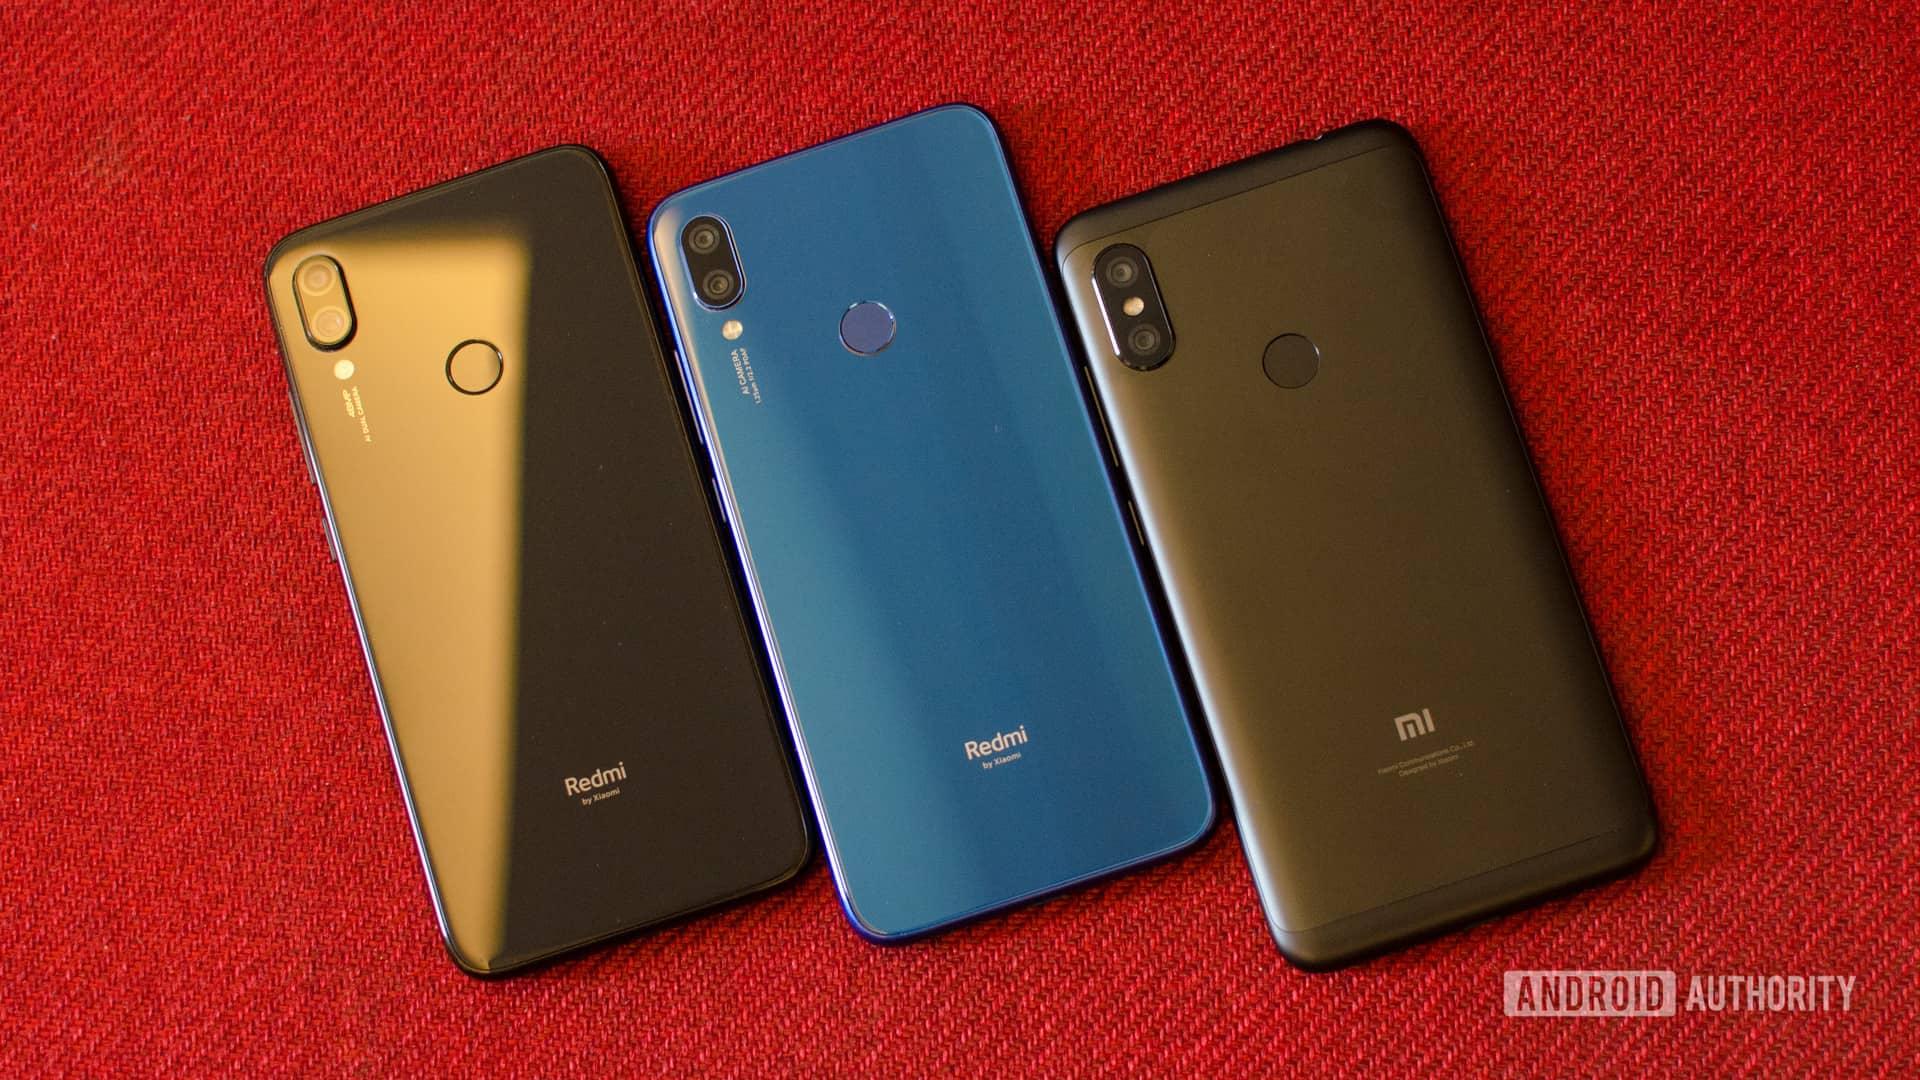 Redmi Note 6 Pro vs Note 7 vs Note 7 Pro back of the phones